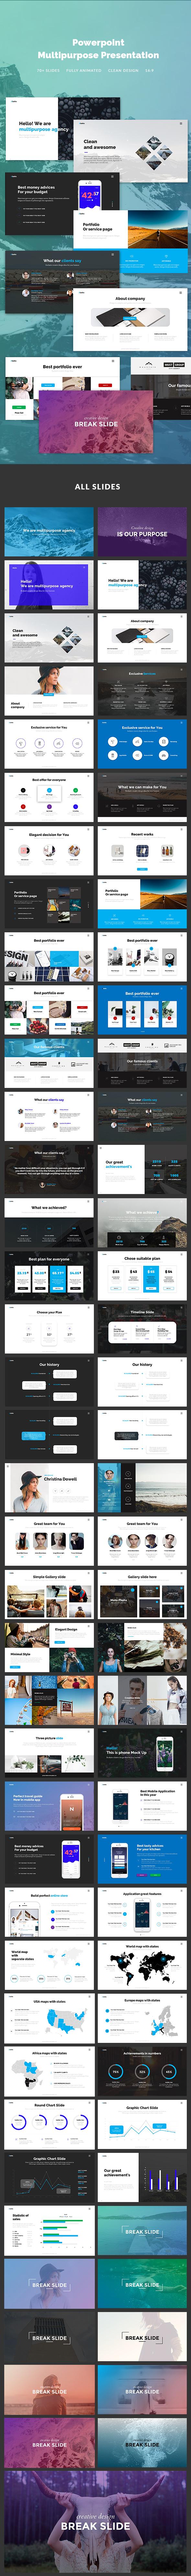 Alaska PowerPoint Presentation - PowerPoint Templates Presentation Templates